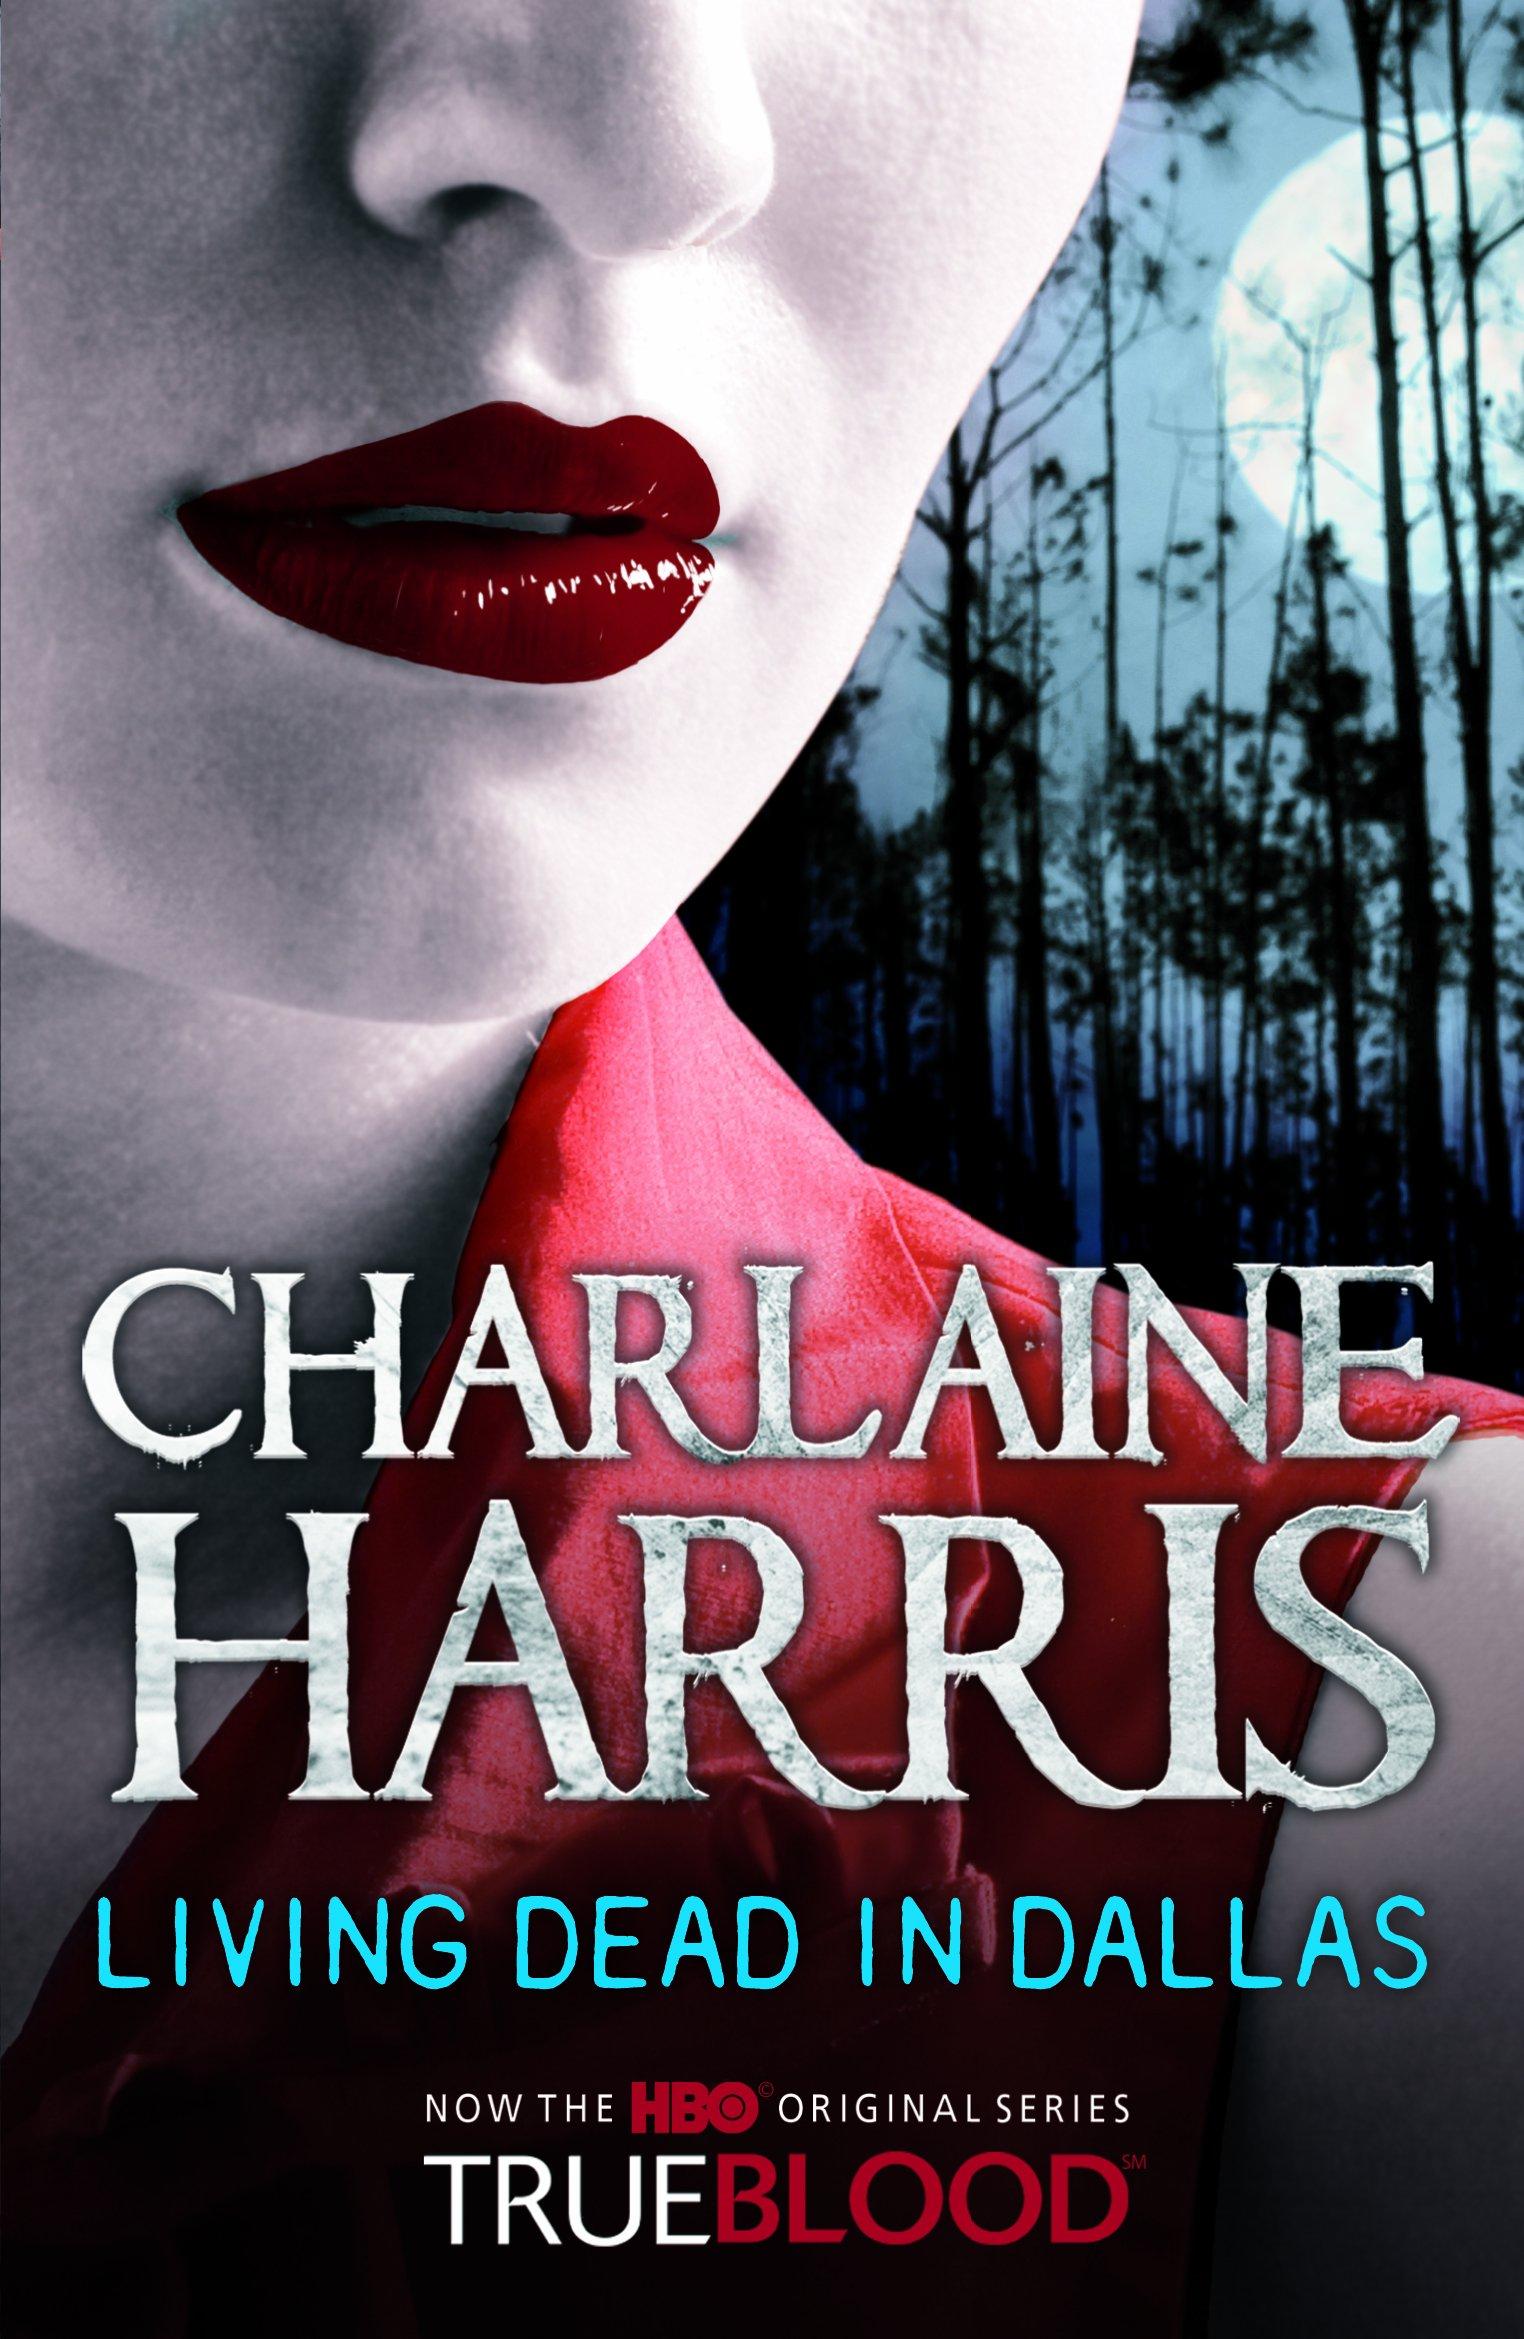 Living Dead In Dallas: A True Blood Novel: 2: Amazon: Charlaine Harris:  9780575089389: Books